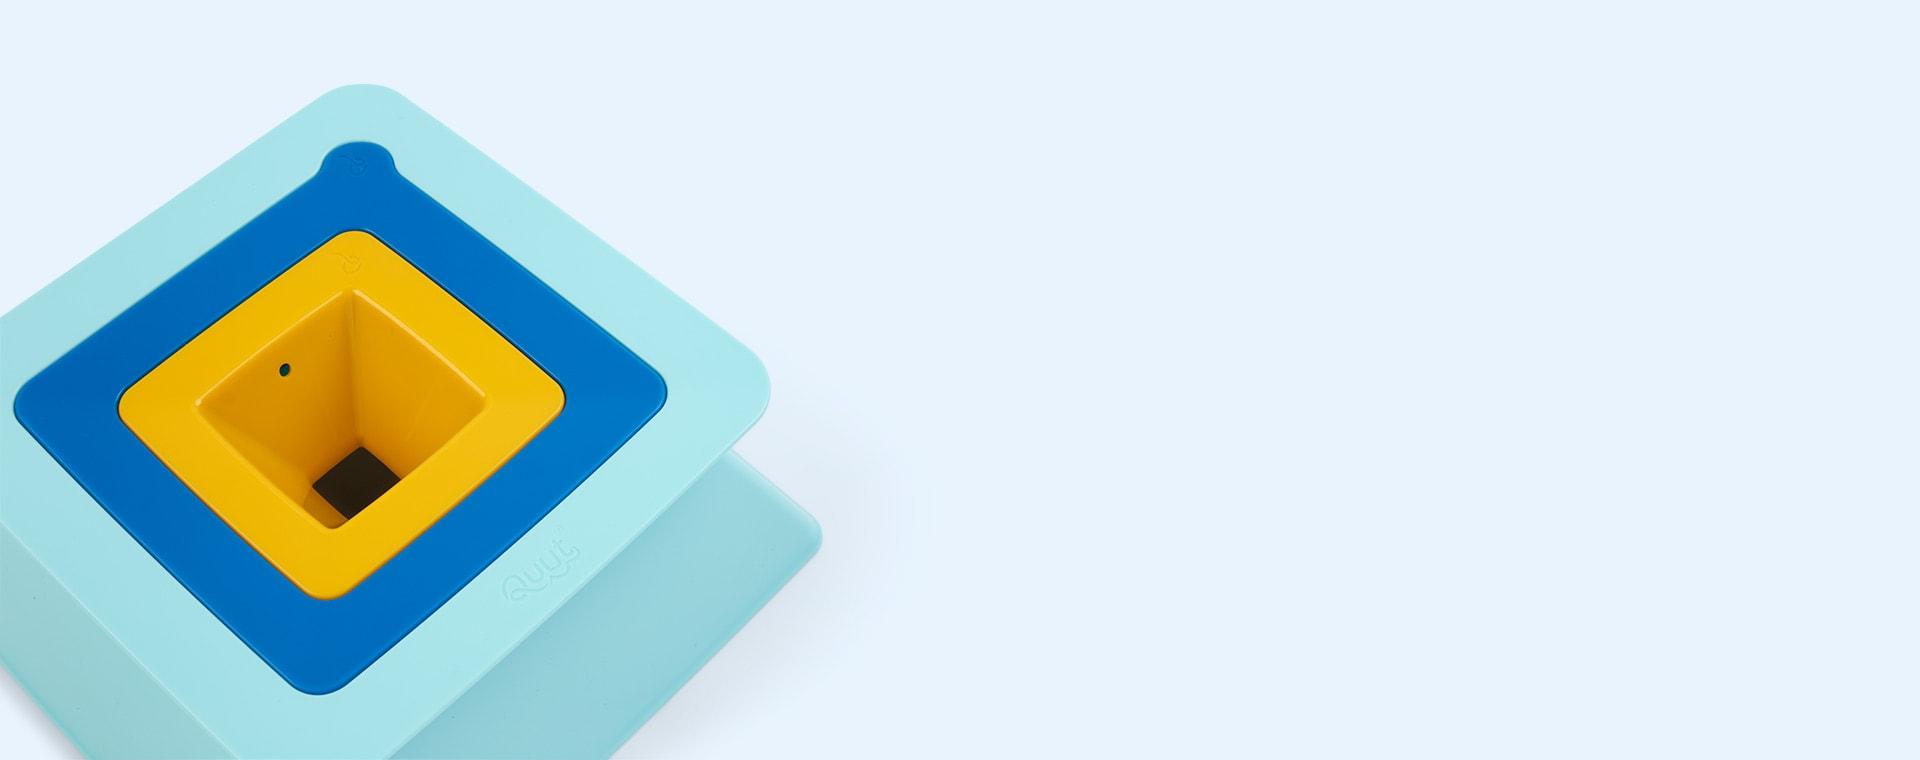 Blue Quut Pira Sand Builder